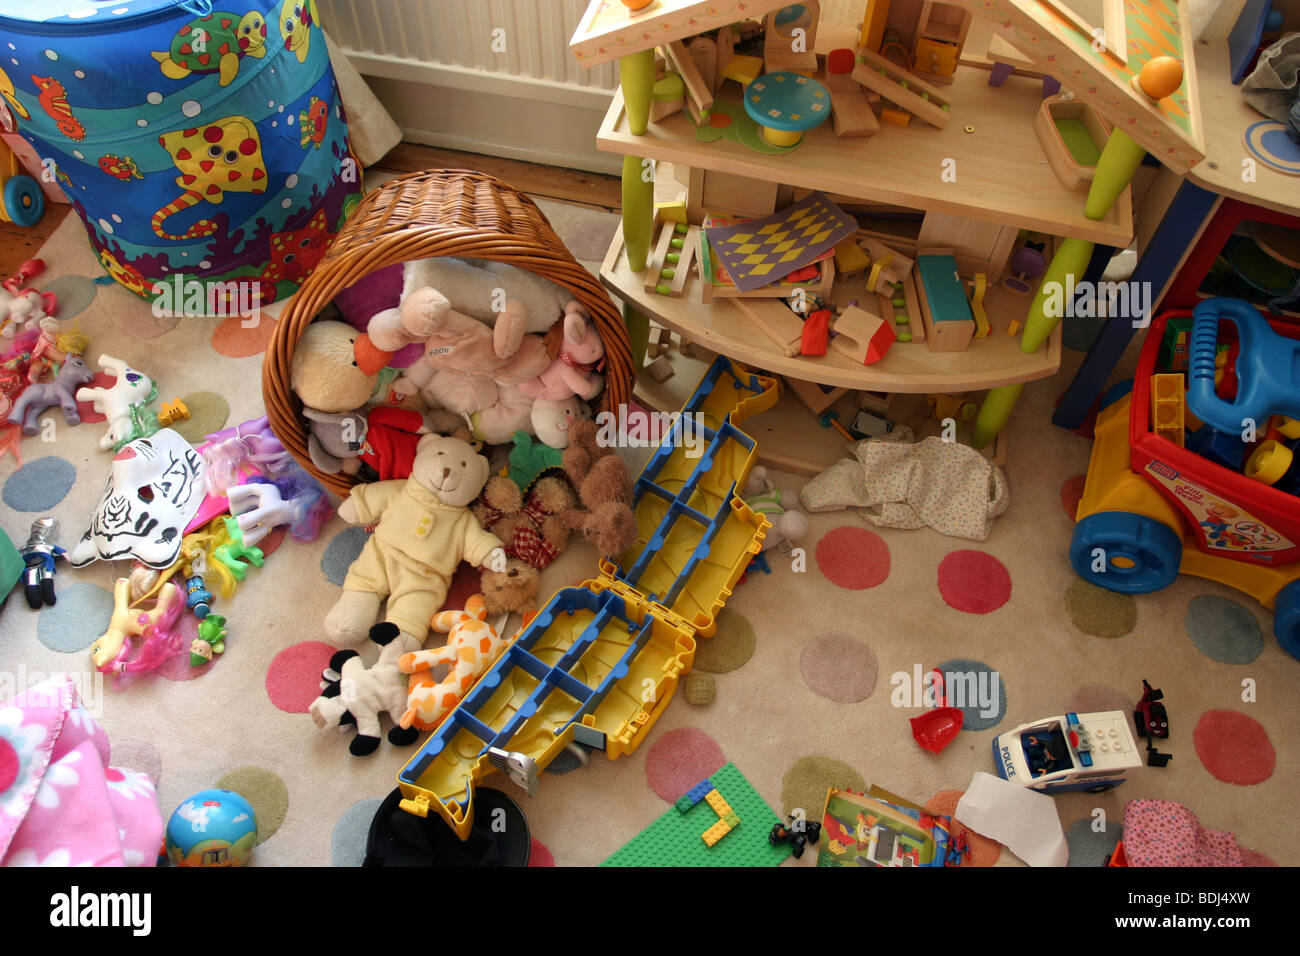 Messy Kids Room Toys Stock Photos & Messy Kids Room Toys ...